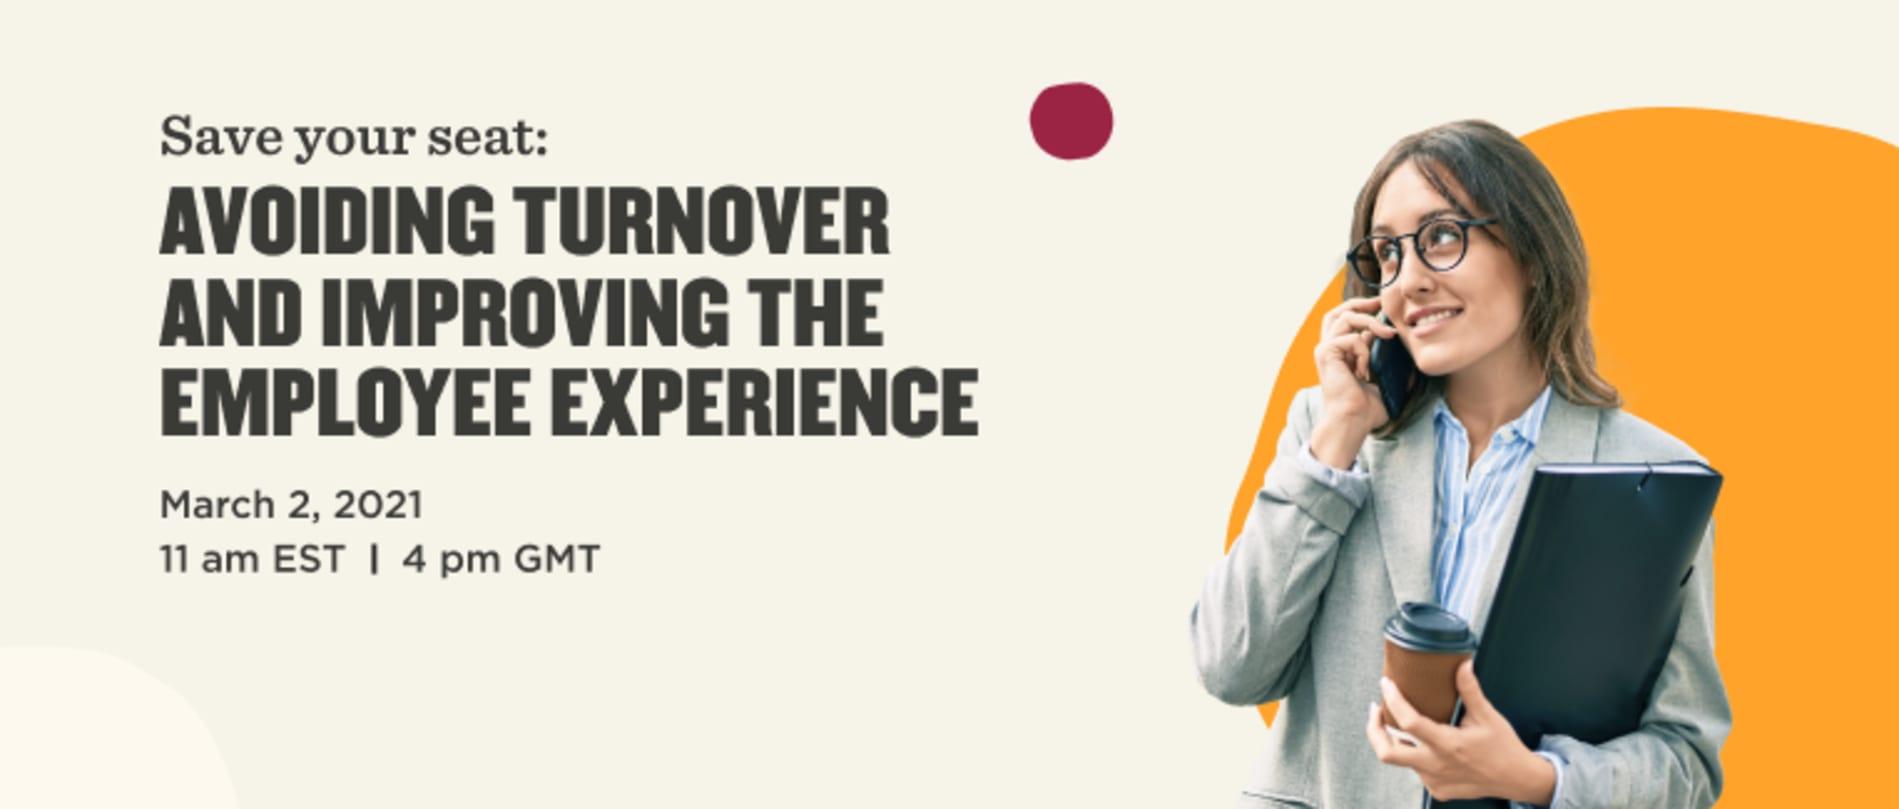 Avoiding turnover and improving the employee experience Webinar - Avoiding-turnover-webinar-_future-webinar-banner.png